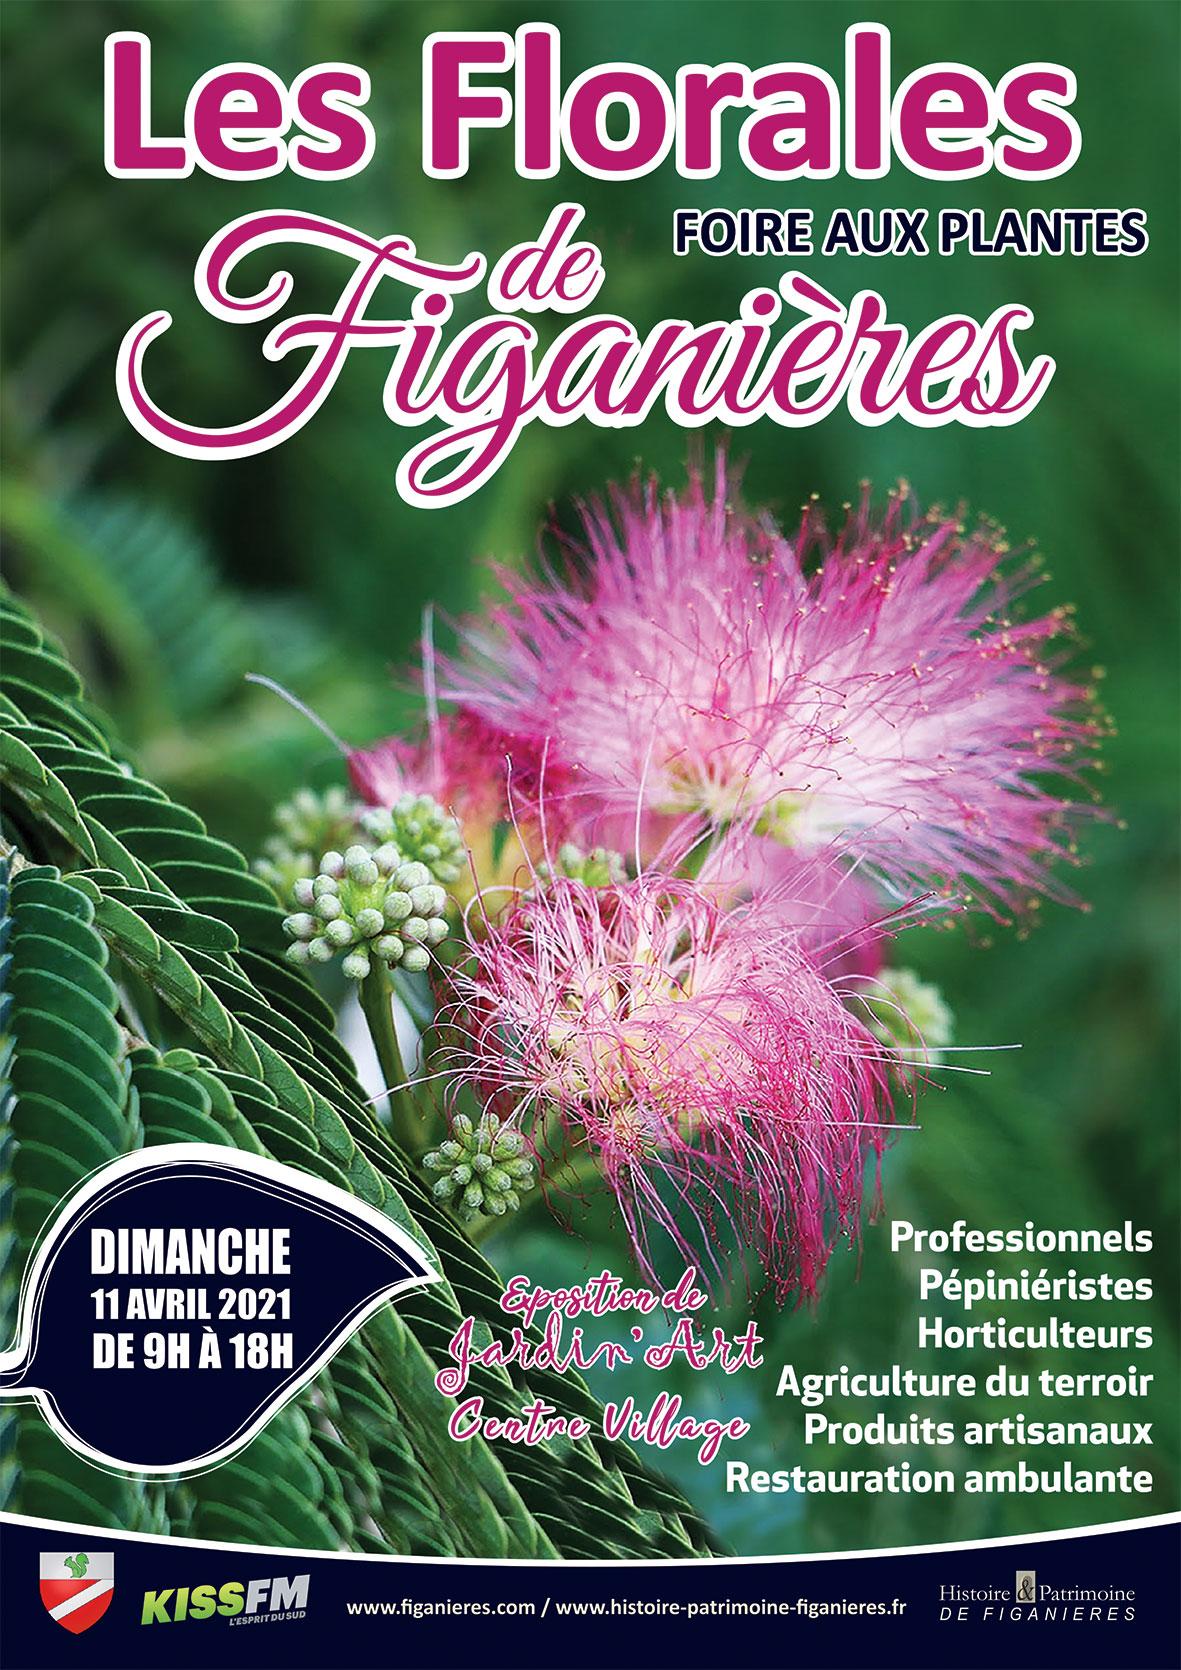 LES-FLORALES-2021-FIGANIERES-WEB-22122020